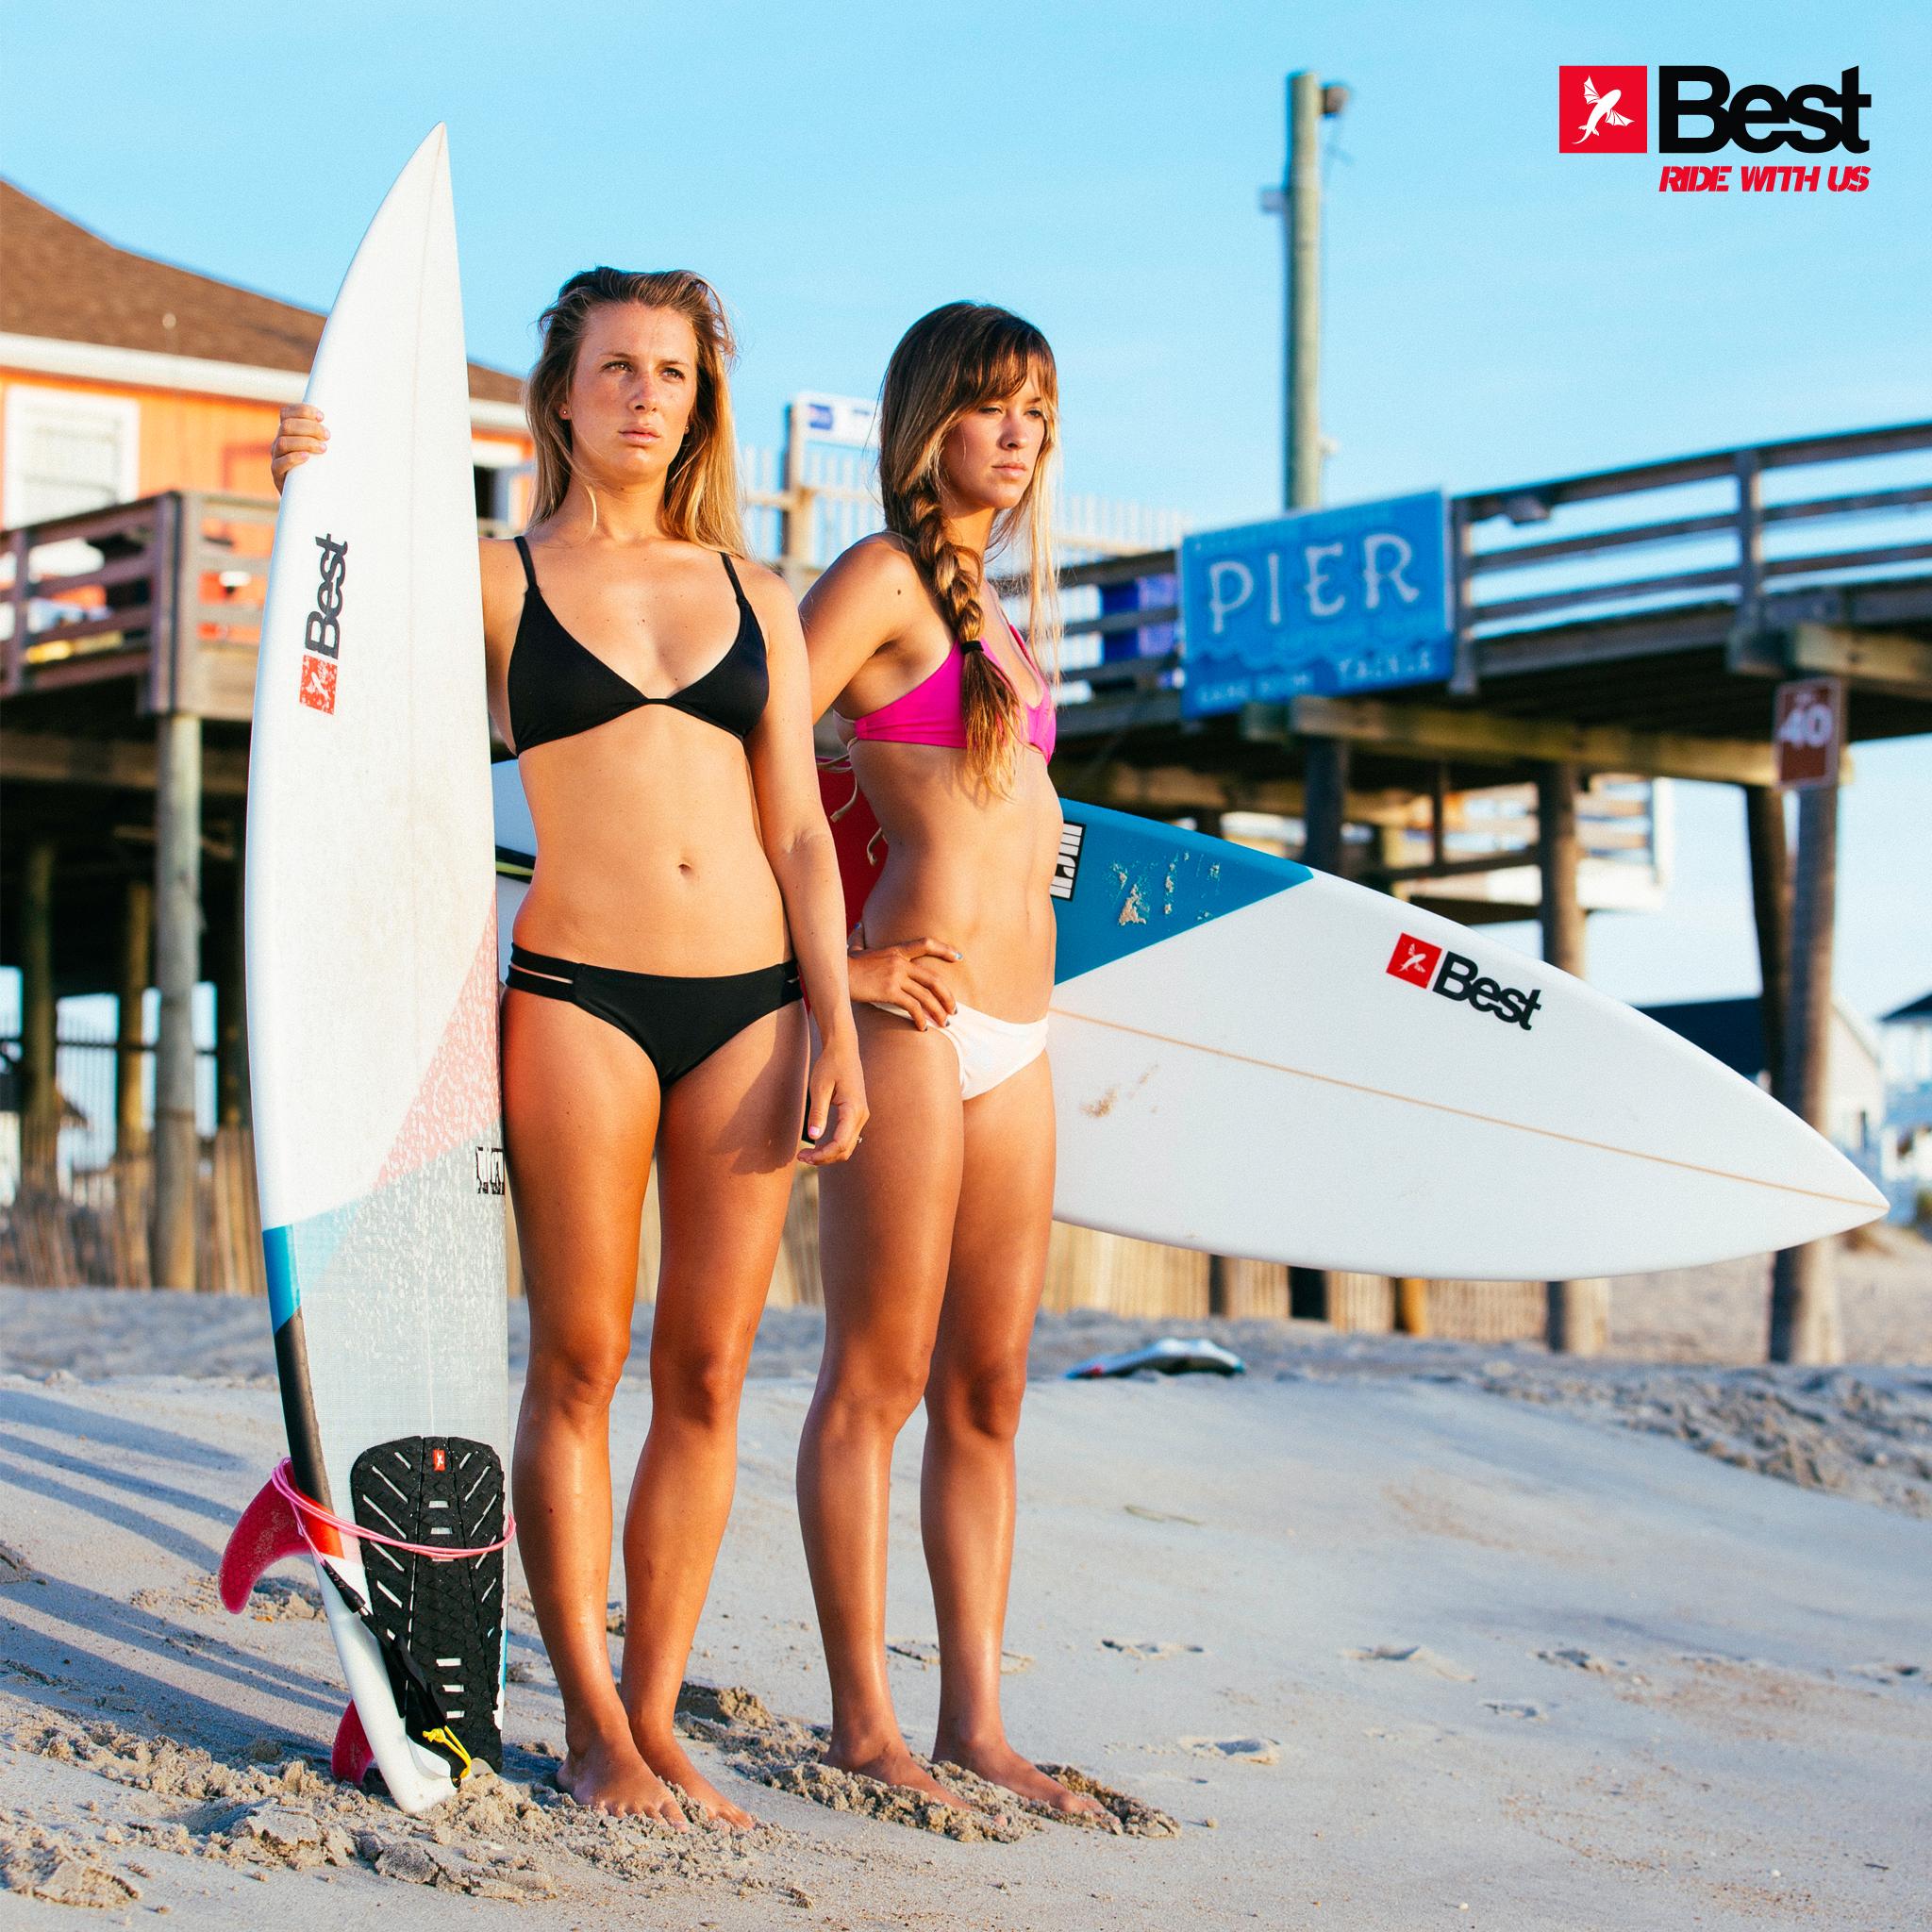 kitesurf wallpaper image - Two Best Kiteboarding kitechicks in bikini with surfboards looking to take a ride - in resolution: iPad 2 & 3 2048 X 2048